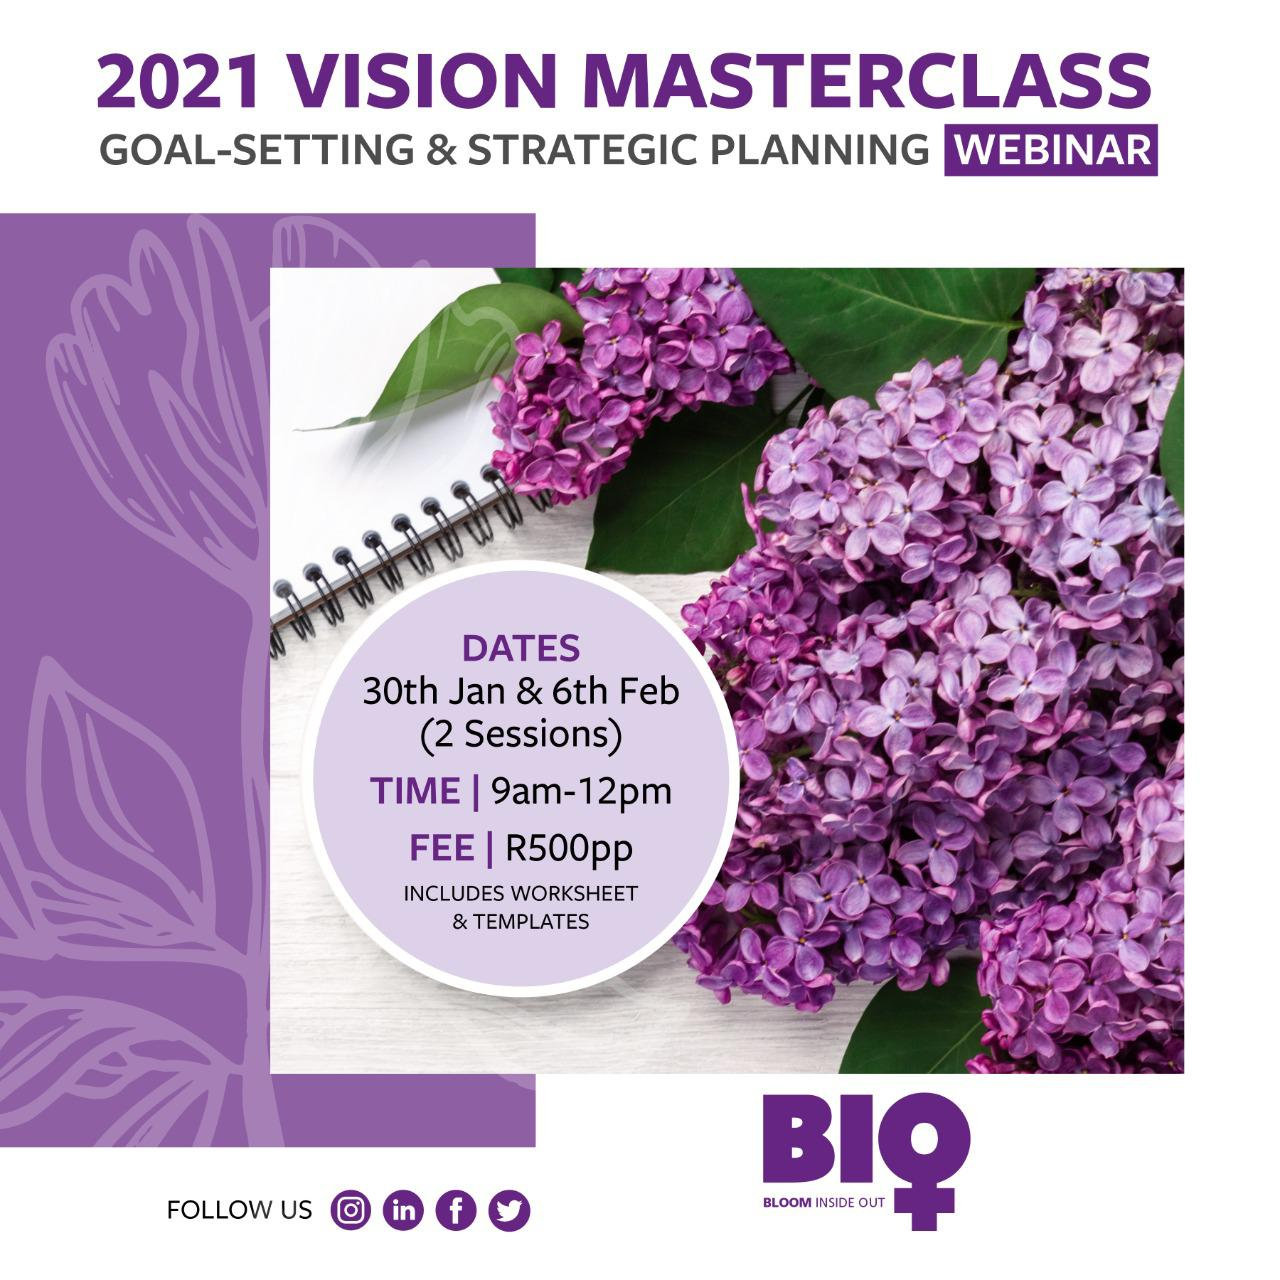 2021 VISION MASTERCLASS